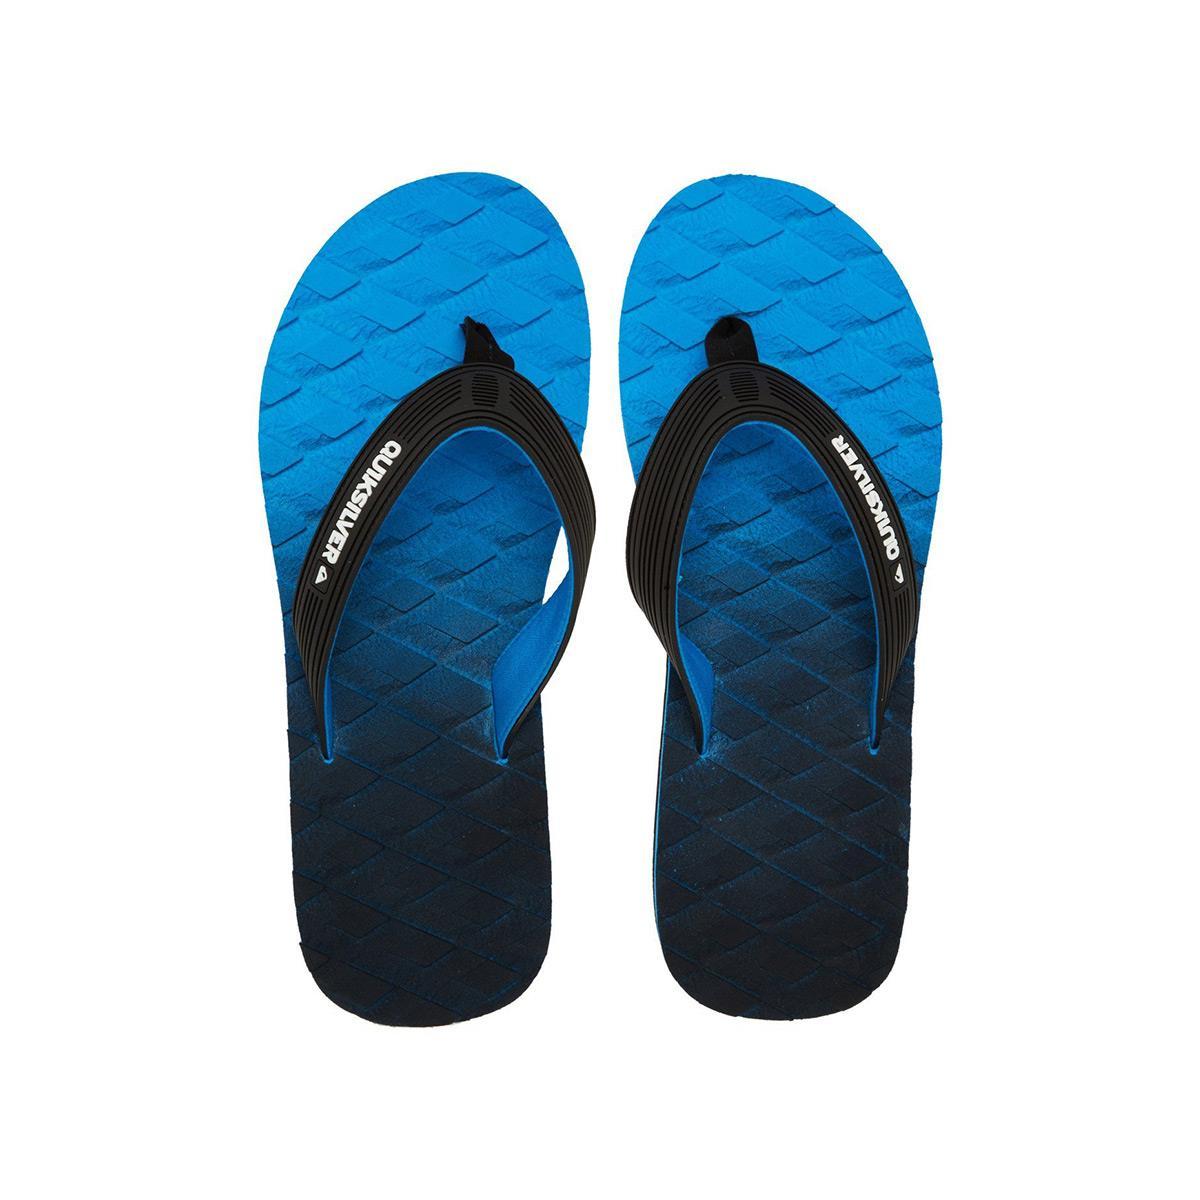 Quiksilver MASSAGE 2 Sandalet AQYL100961